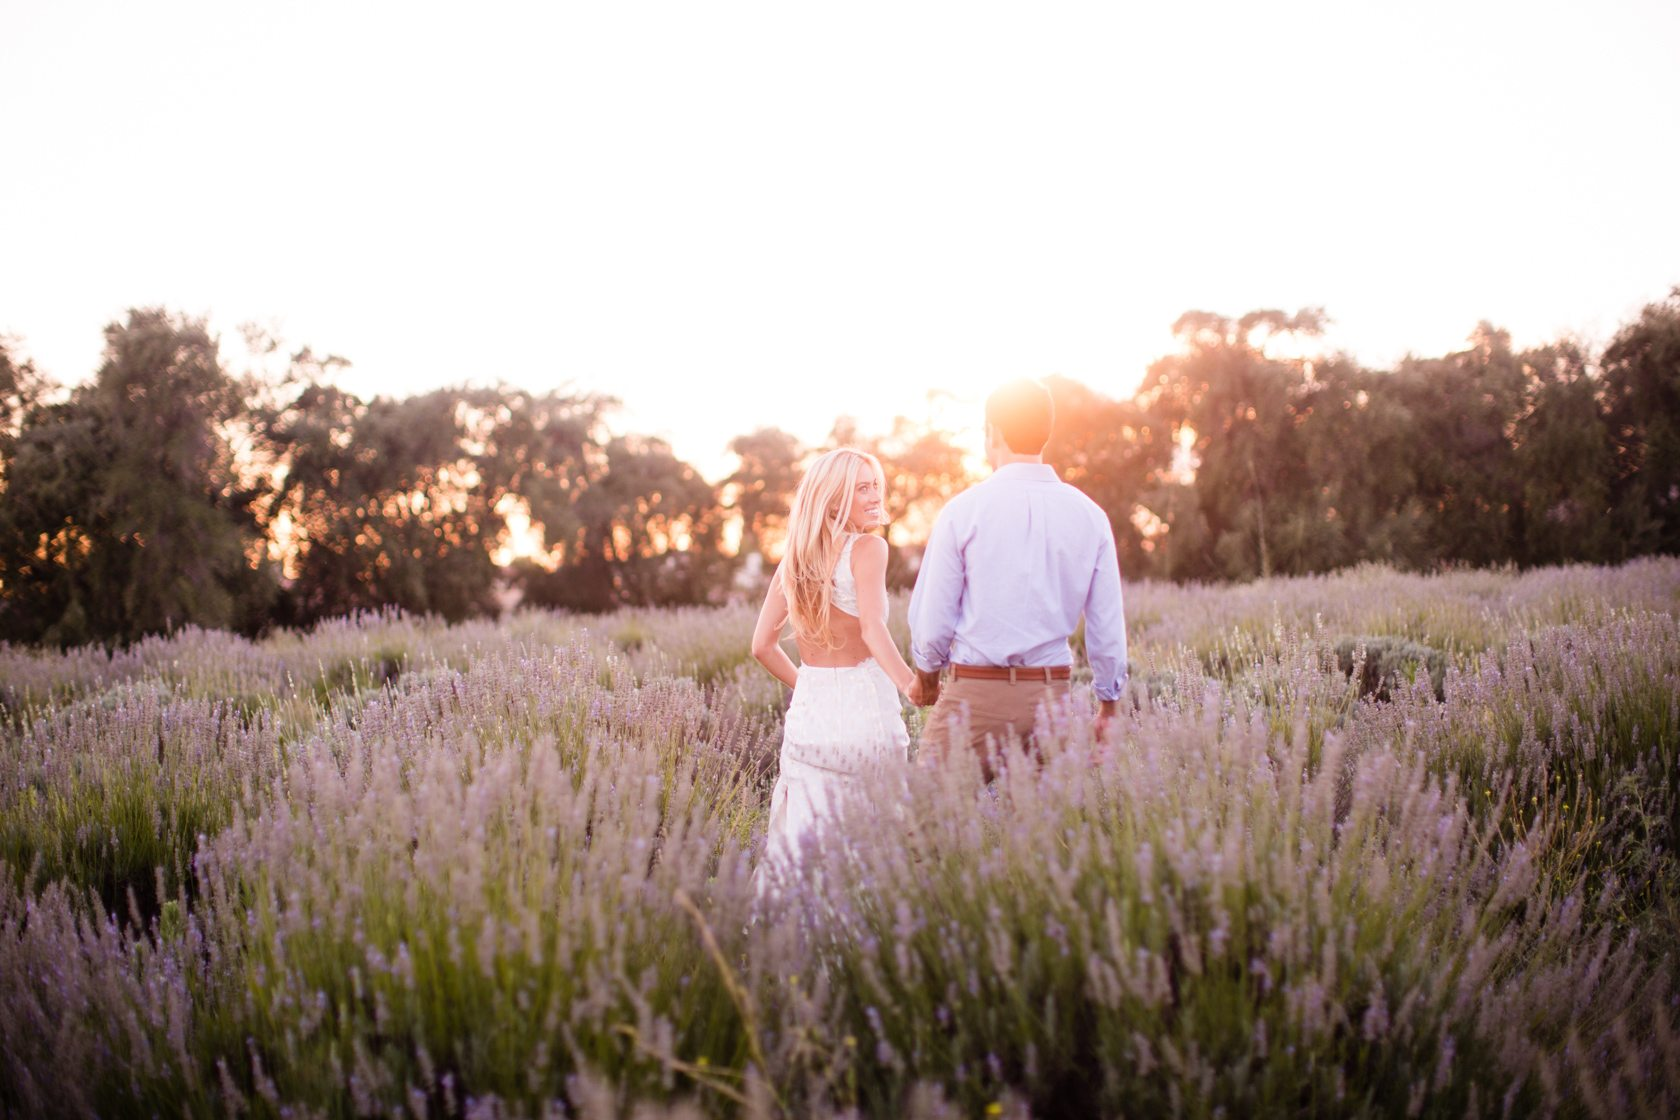 Highland_Springs_Lavender_Field_Engagement_04.jpg